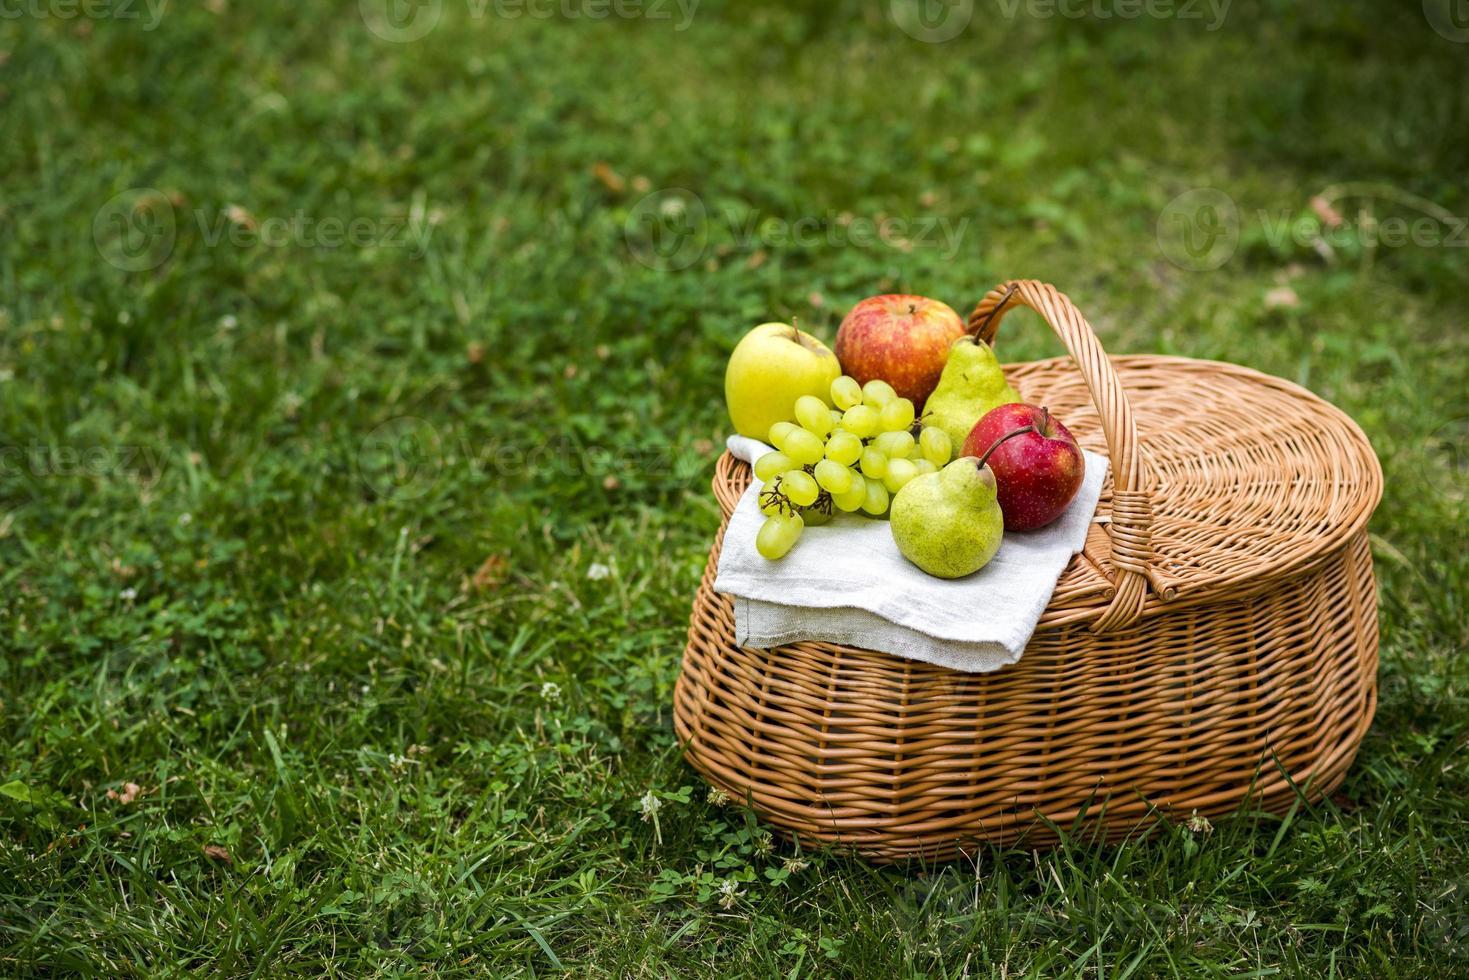 hoge hoek picknickmand met fruit op groen gras foto